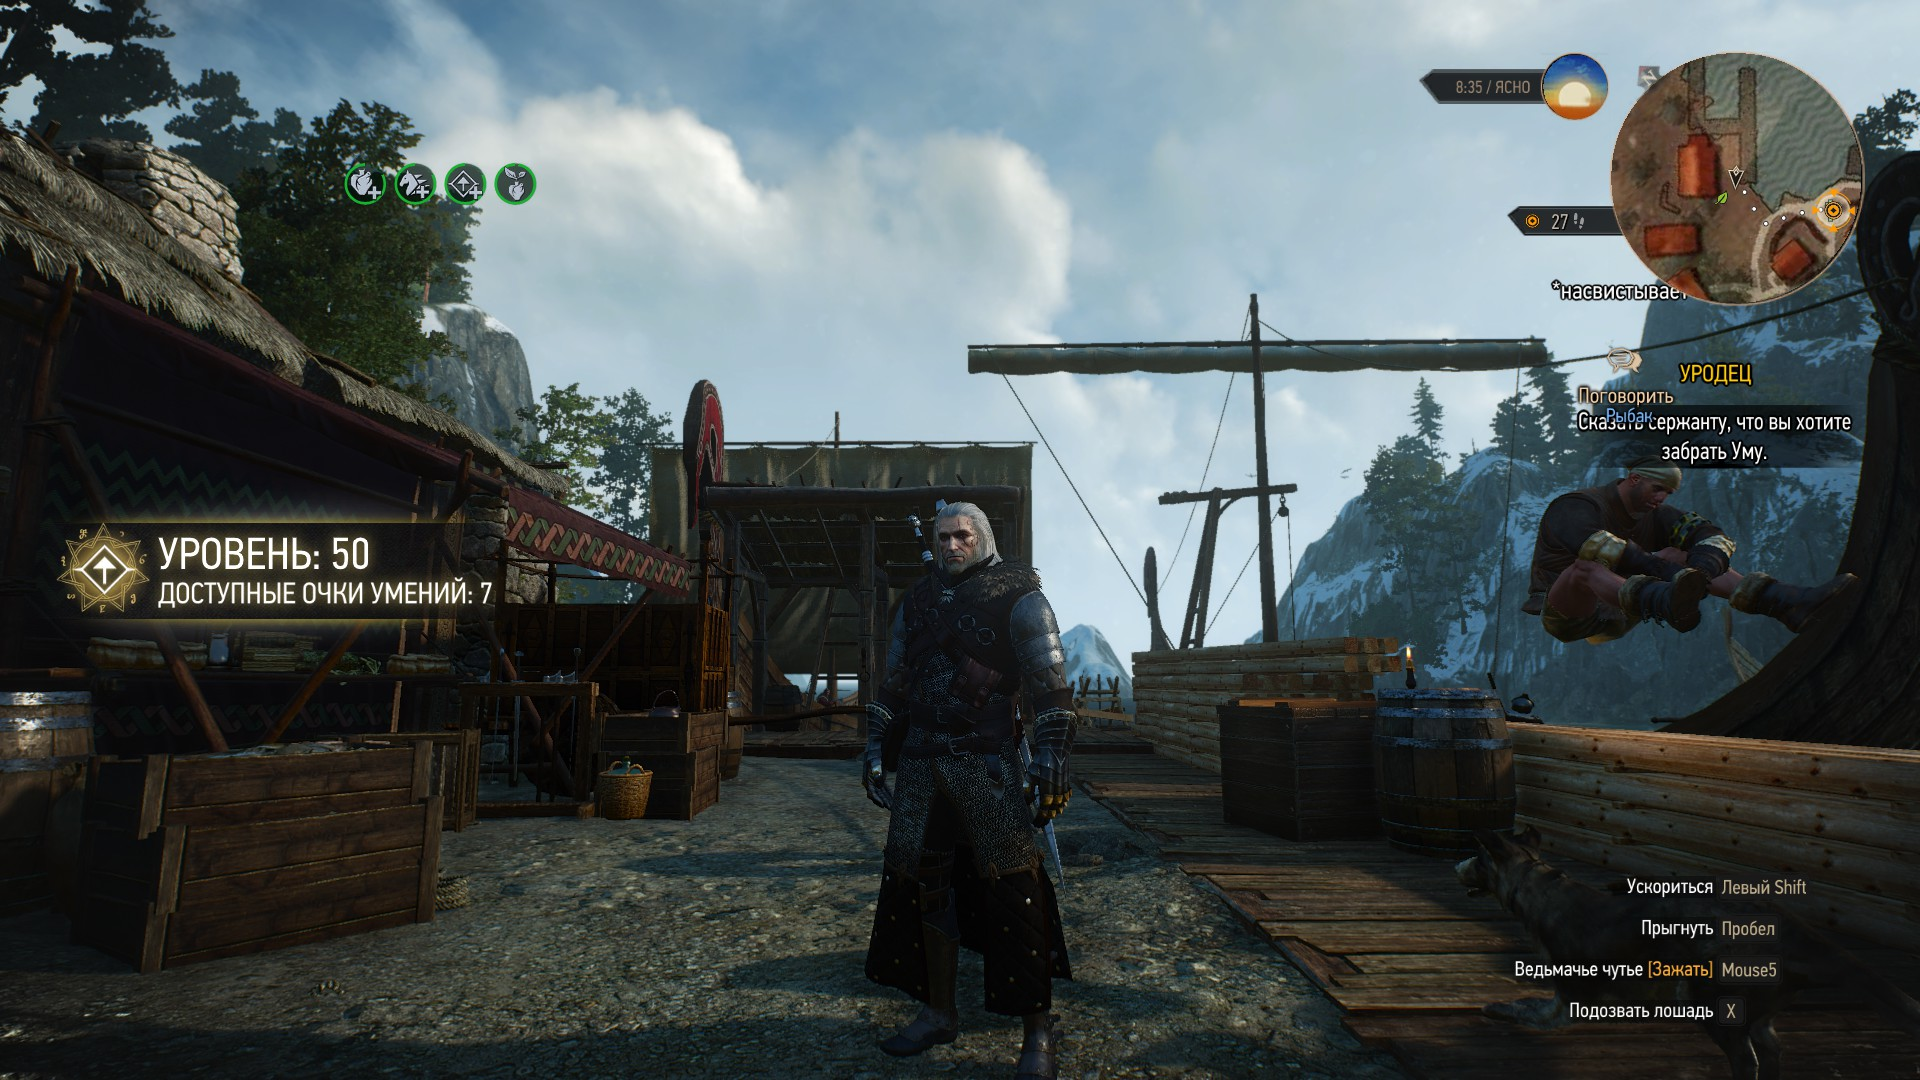 Левитирующий моряк - Witcher 3: Wild Hunt, the Юмор